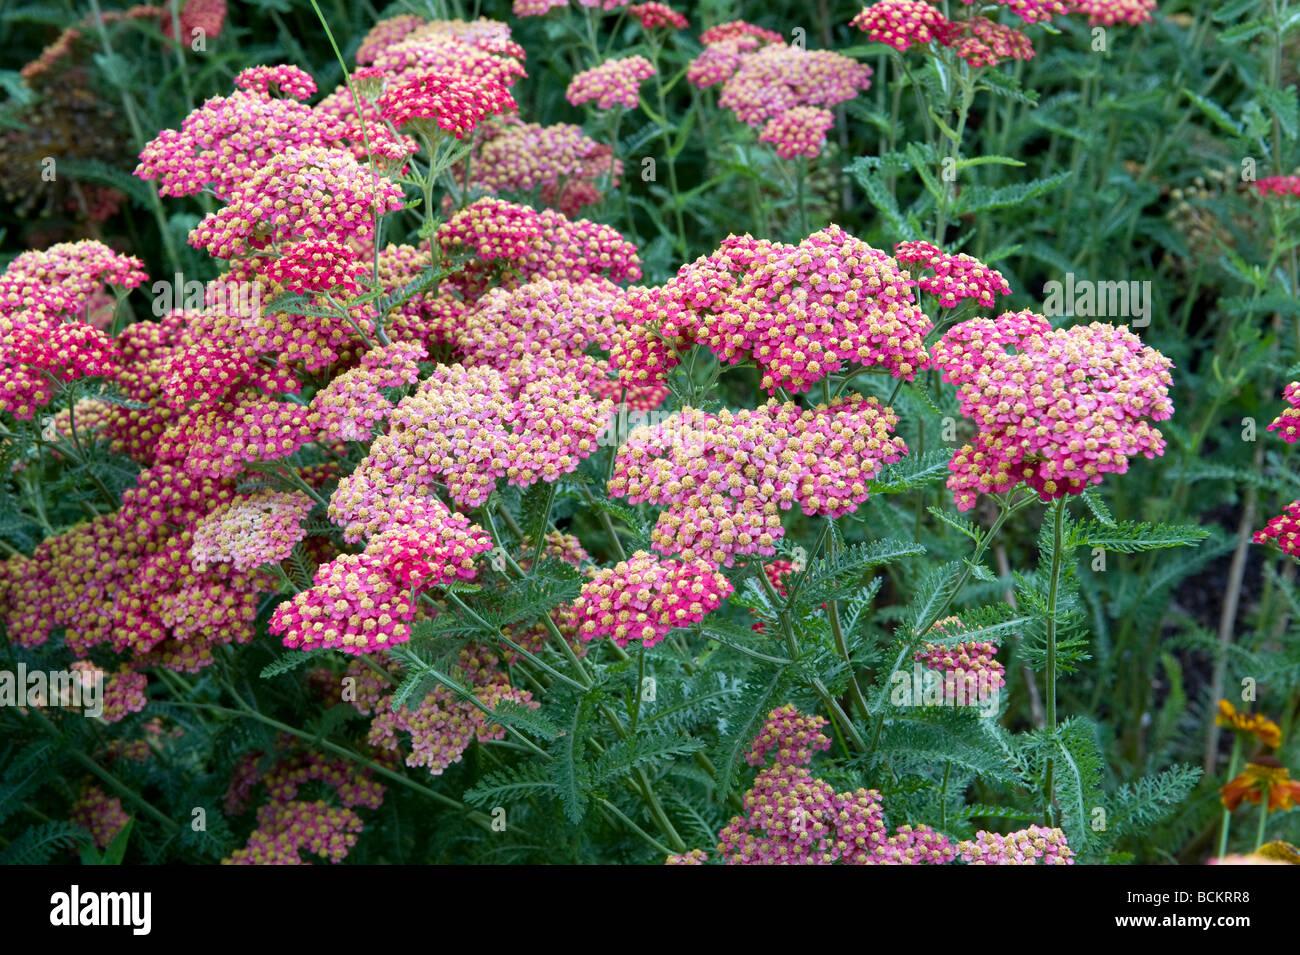 Asteraceae/Compositae Achillea millefolium `Cerise Queen`. Beautiful small pink flowers forming a larger flowerhead. - Stock Image